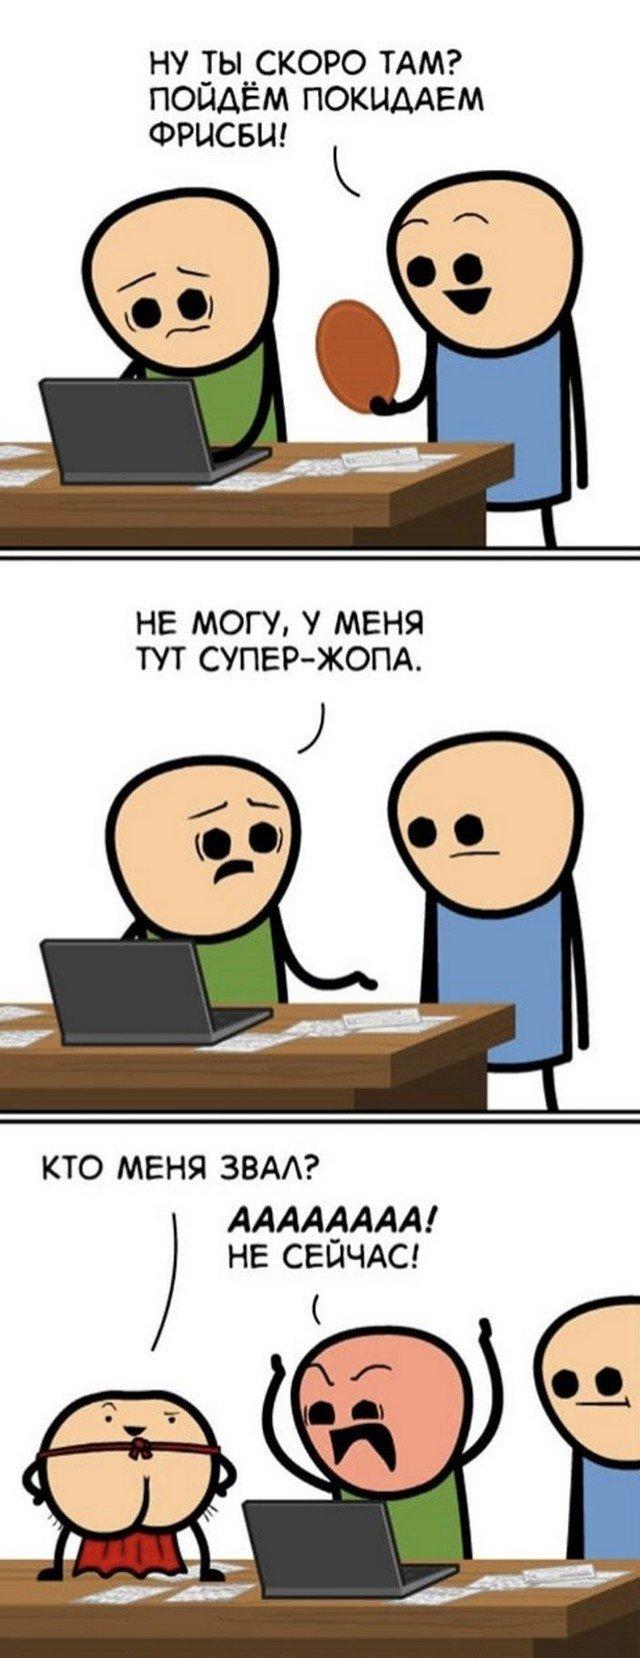 Юмор из интернета